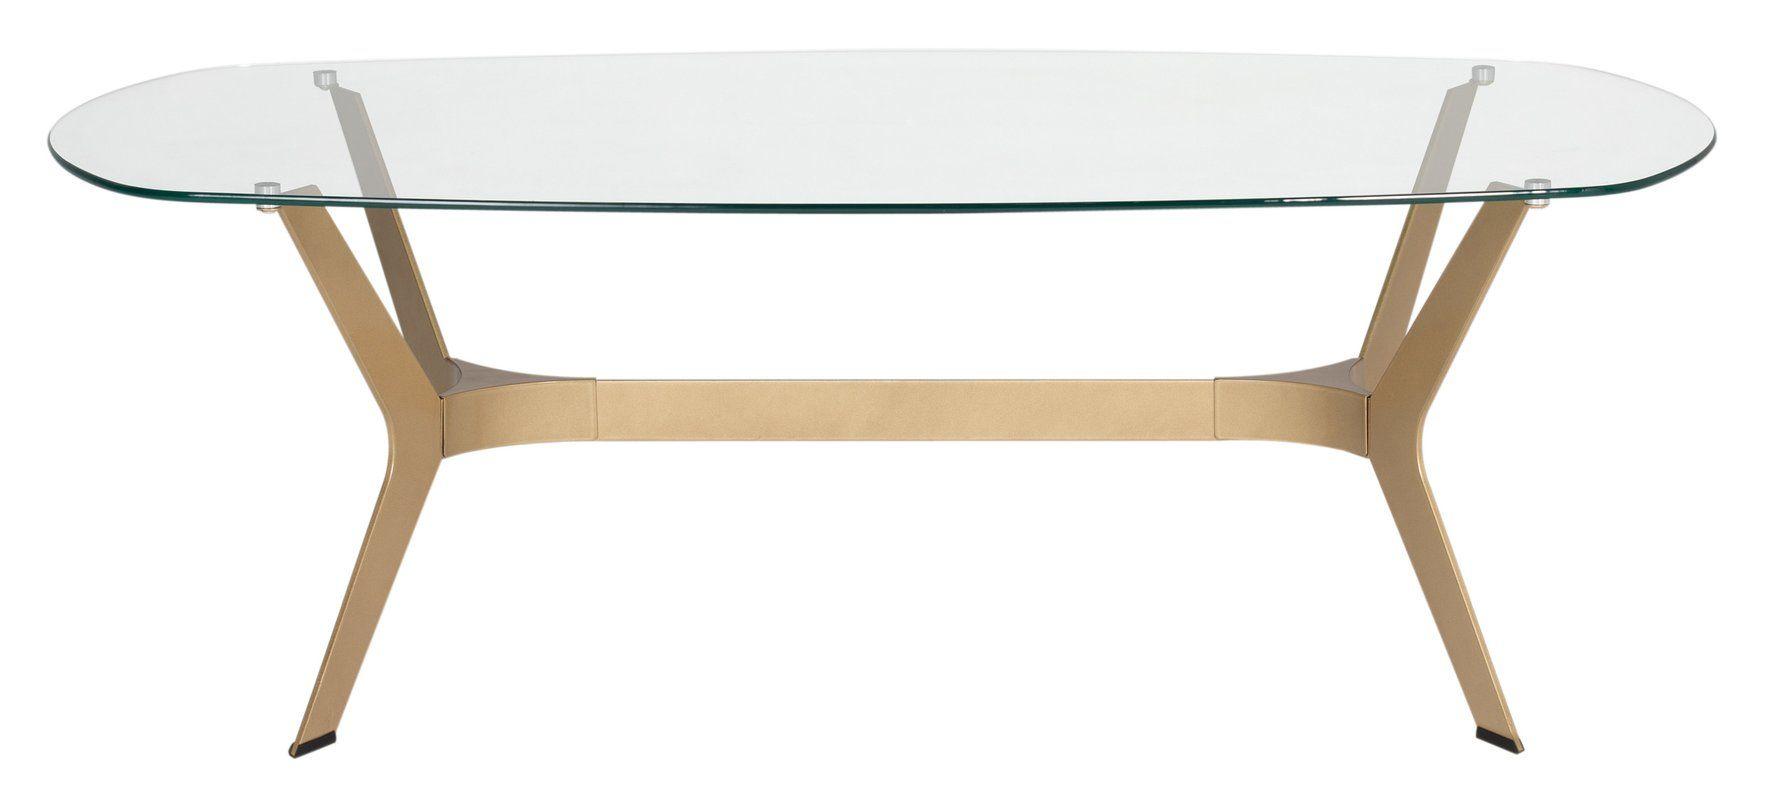 Redington Modern Coffee Table Coffee Table Modern Coffee Tables Round Coffee Table Living Room [ 800 x 1777 Pixel ]